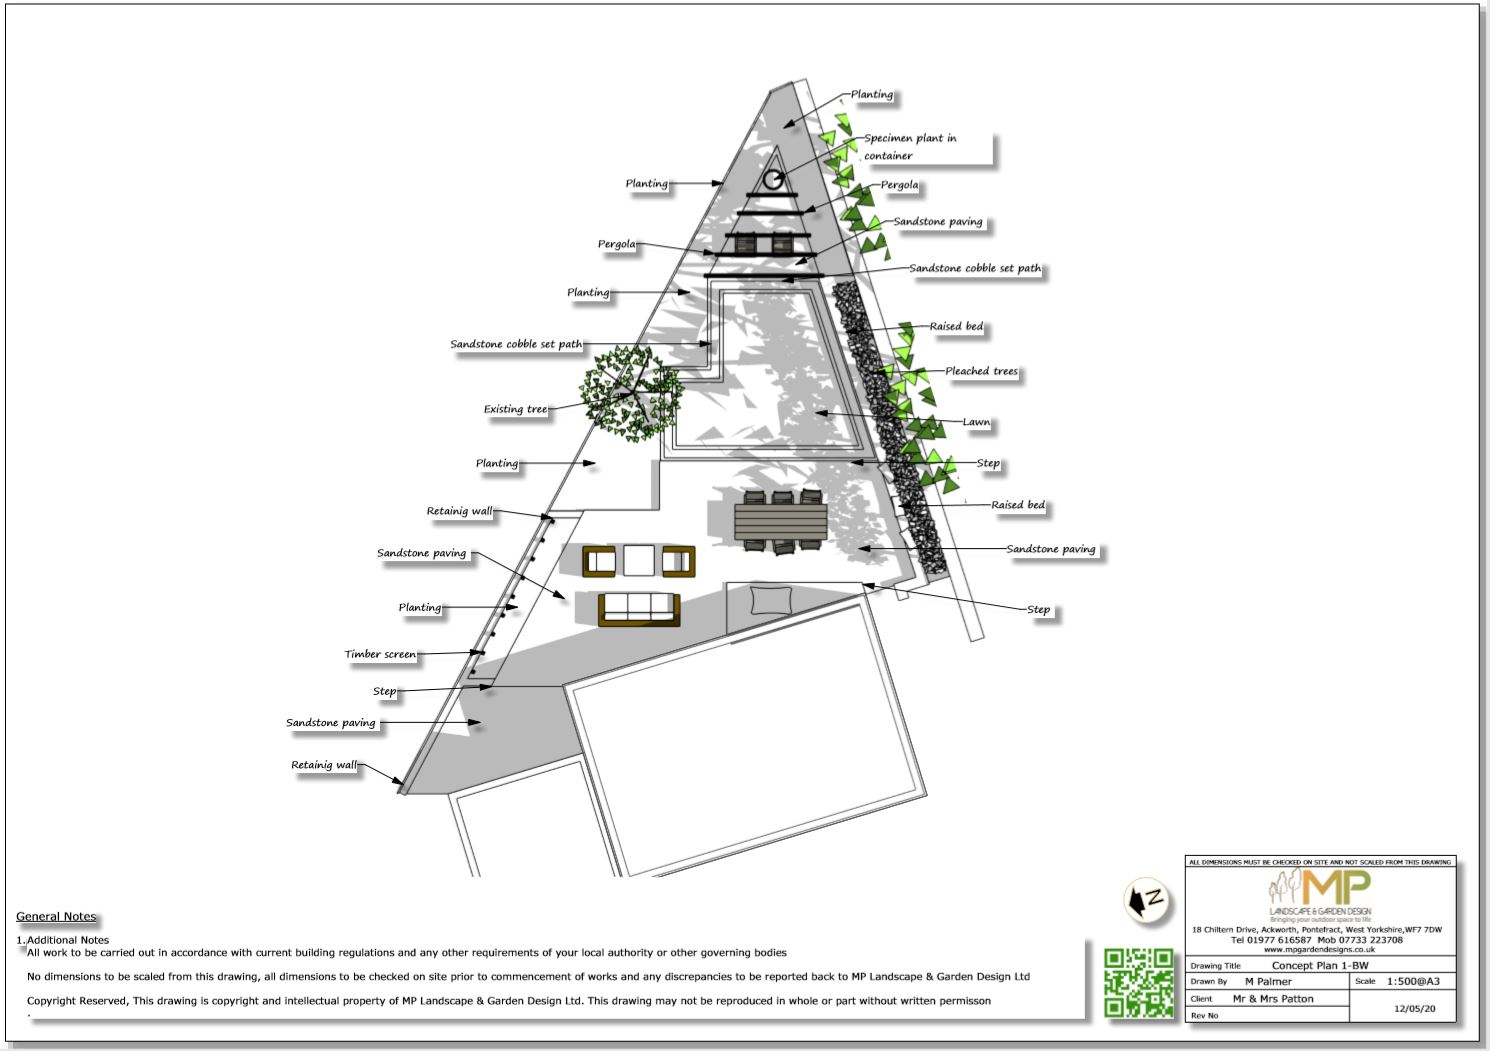 3, Concept plan-1, Stanley, Wakefield